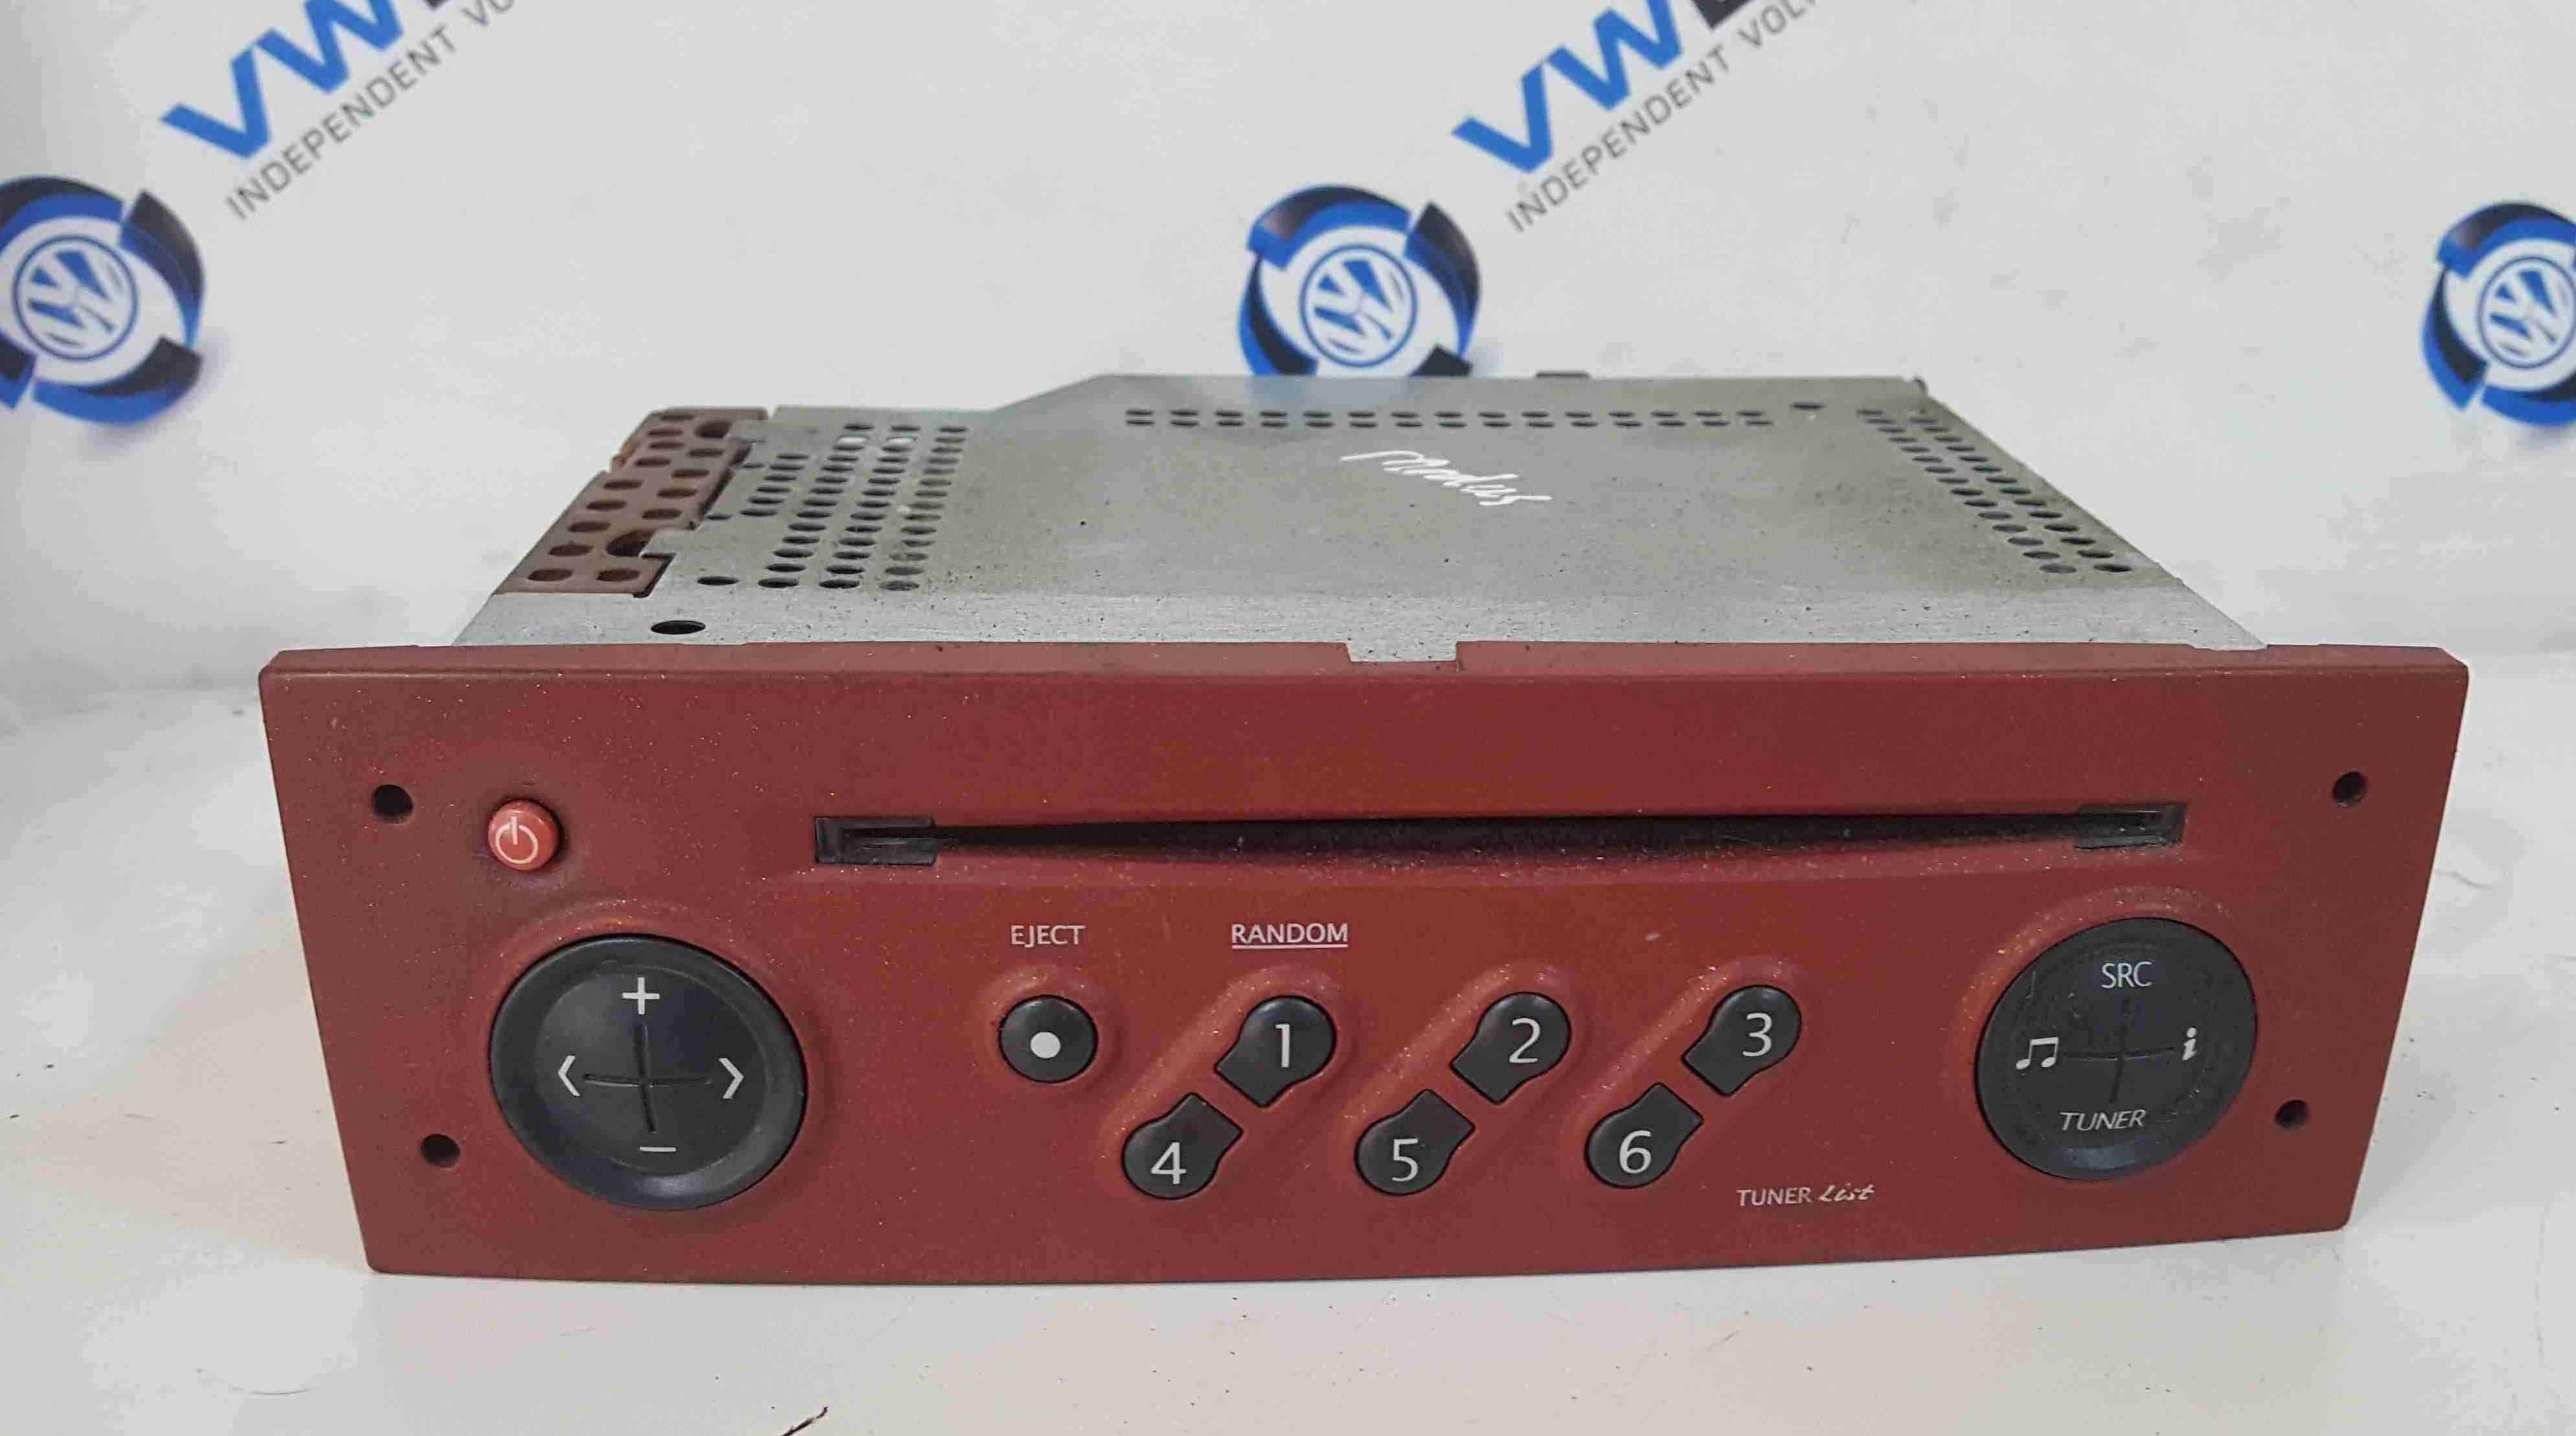 Renault Modus 2004-2008 Radio Cd Player Tuner List Red + Code 8200377864